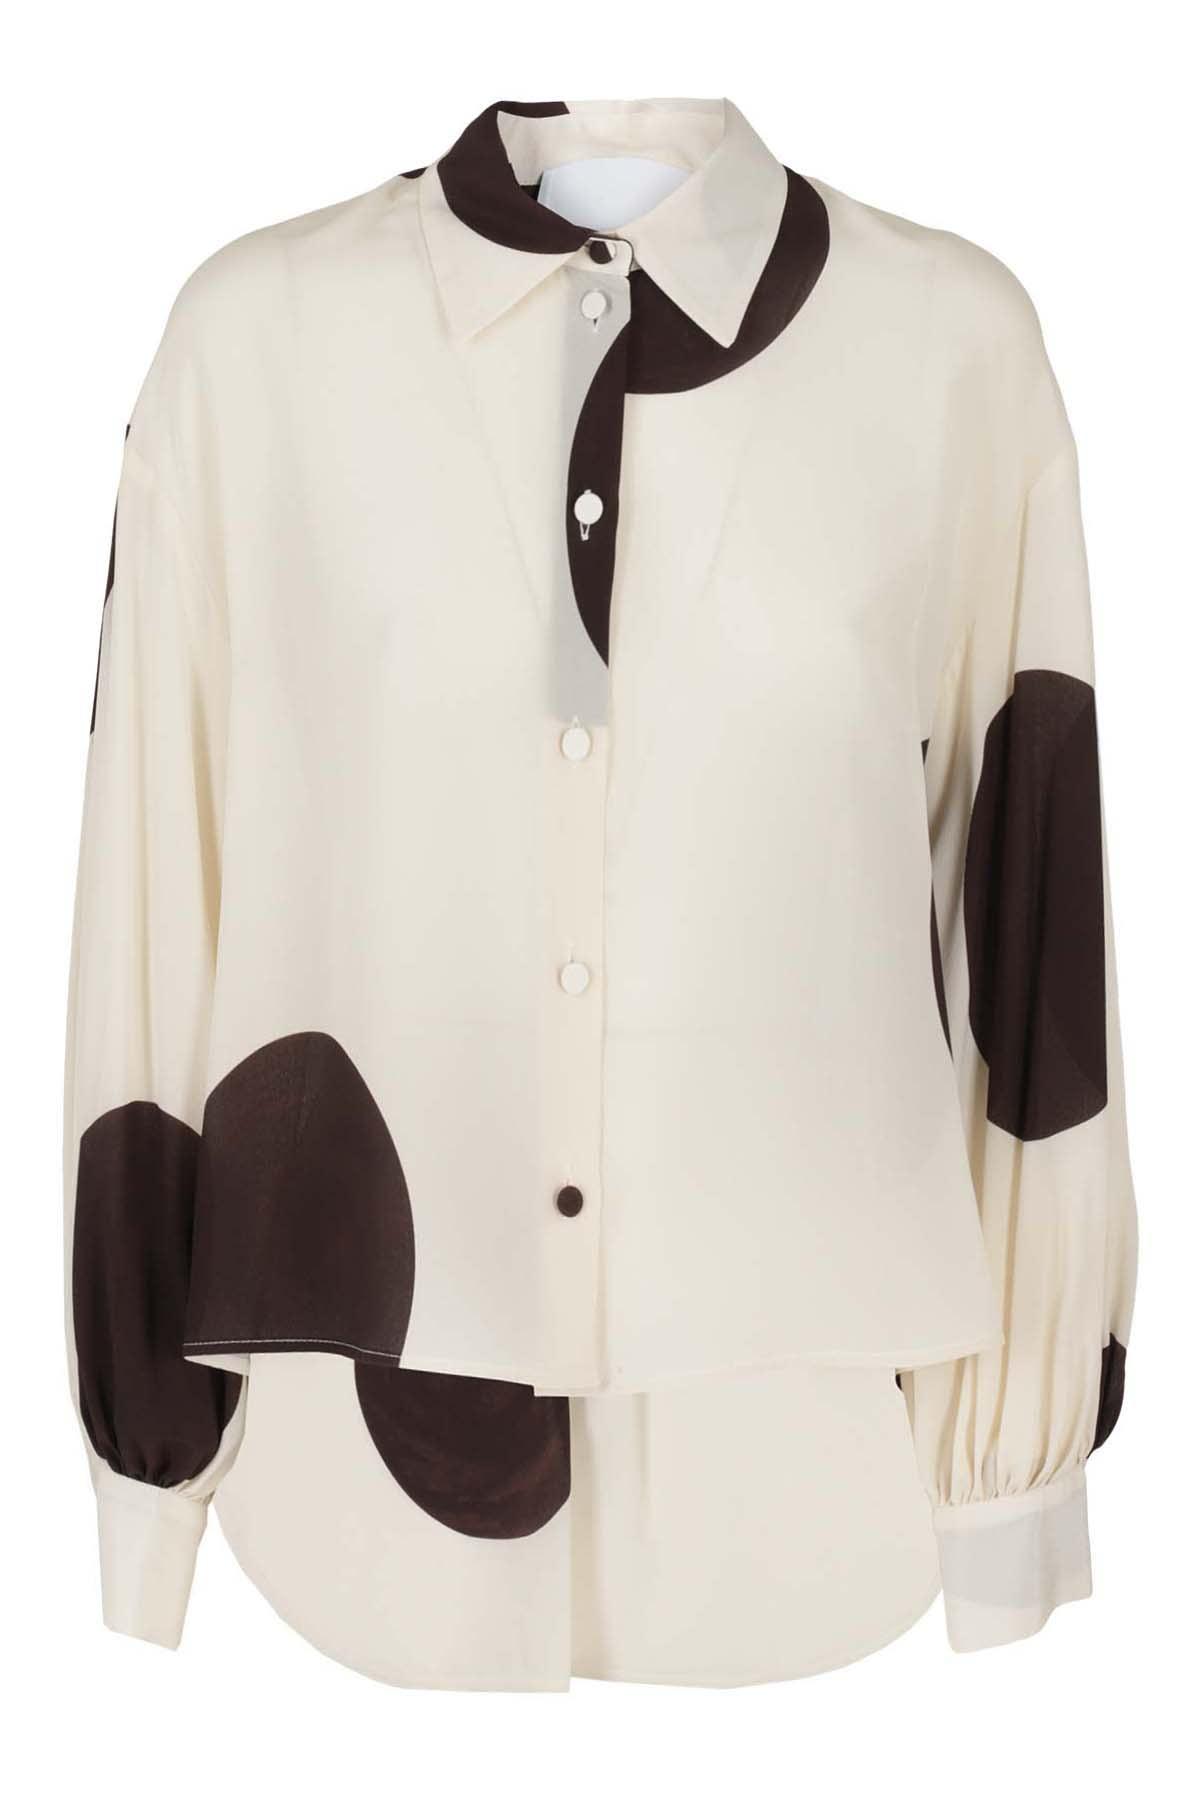 Erika Cavallini Shirts SHIRT